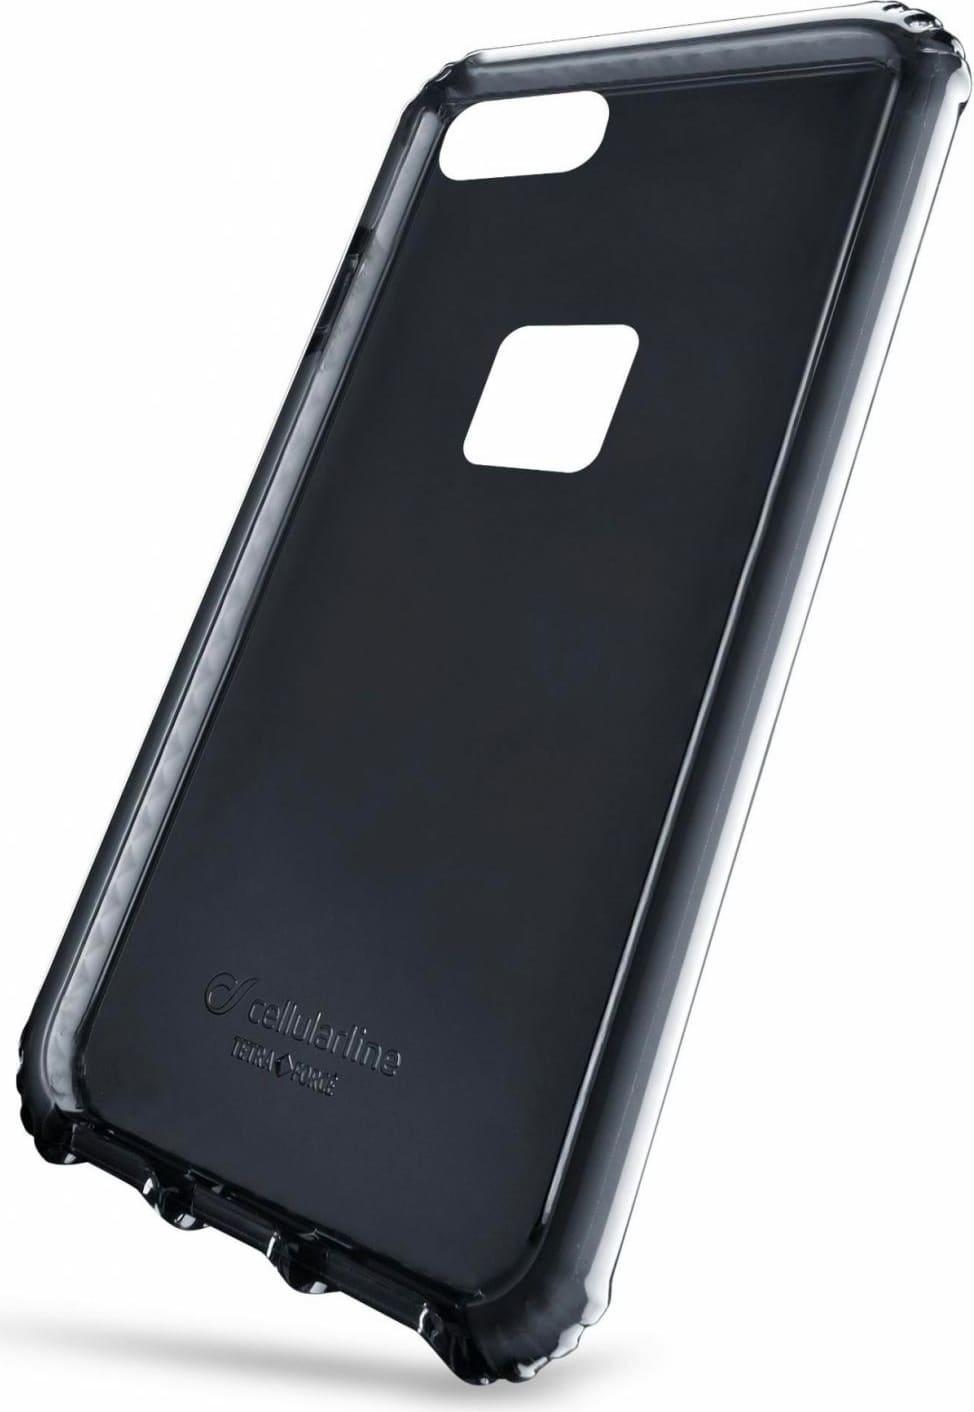 custodia Per Smartphone Huawei P10 Lite apri e chiudi